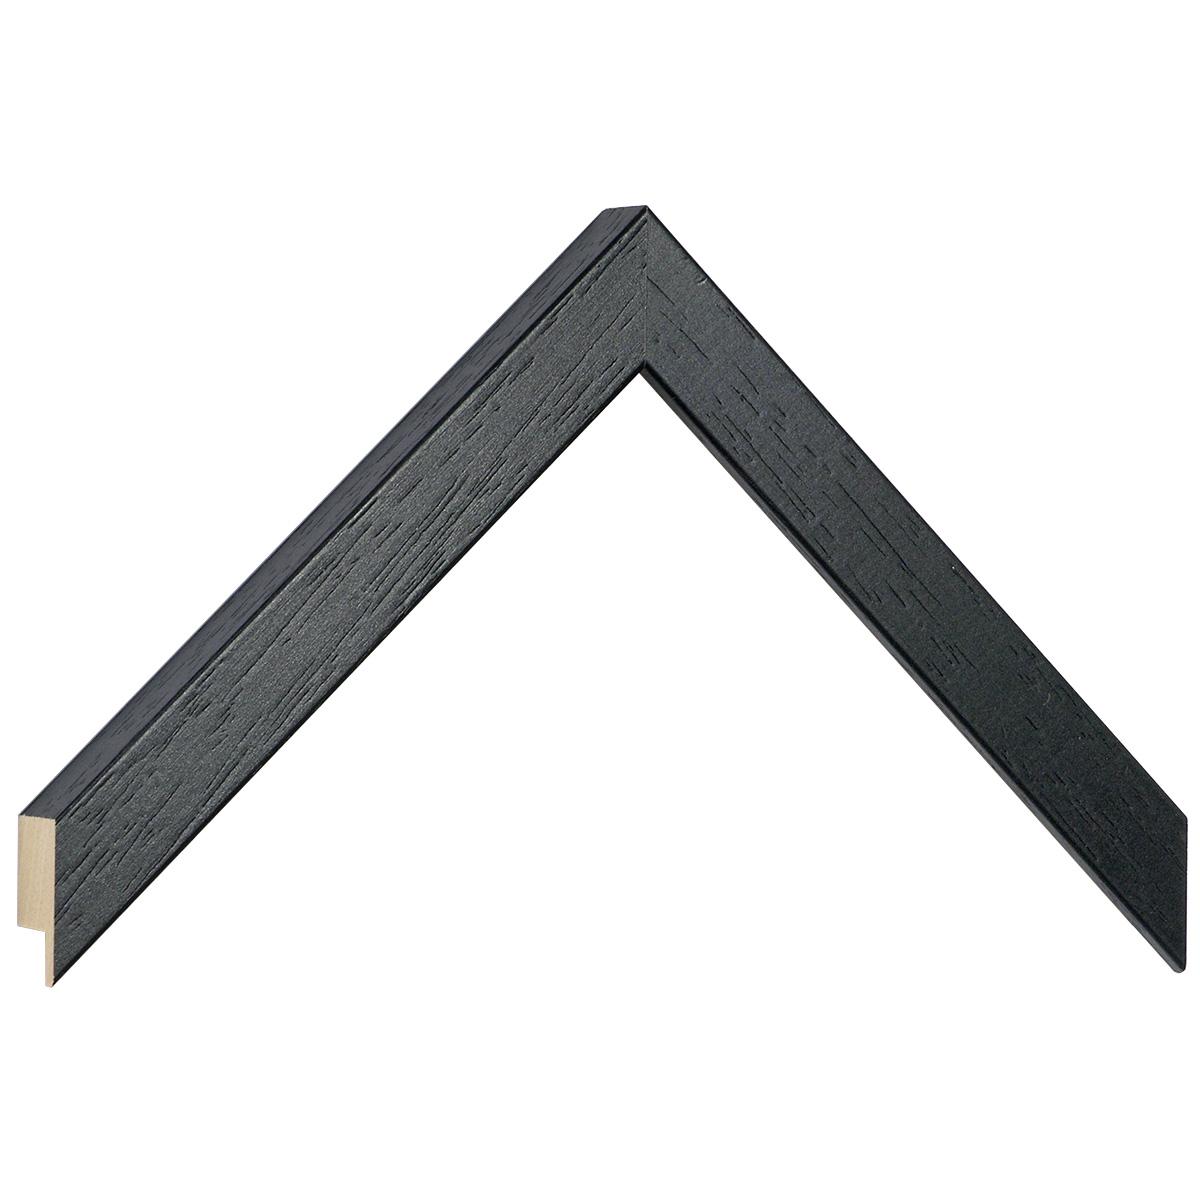 Moulding ayous, width 20mm height 20 - Black, open grain